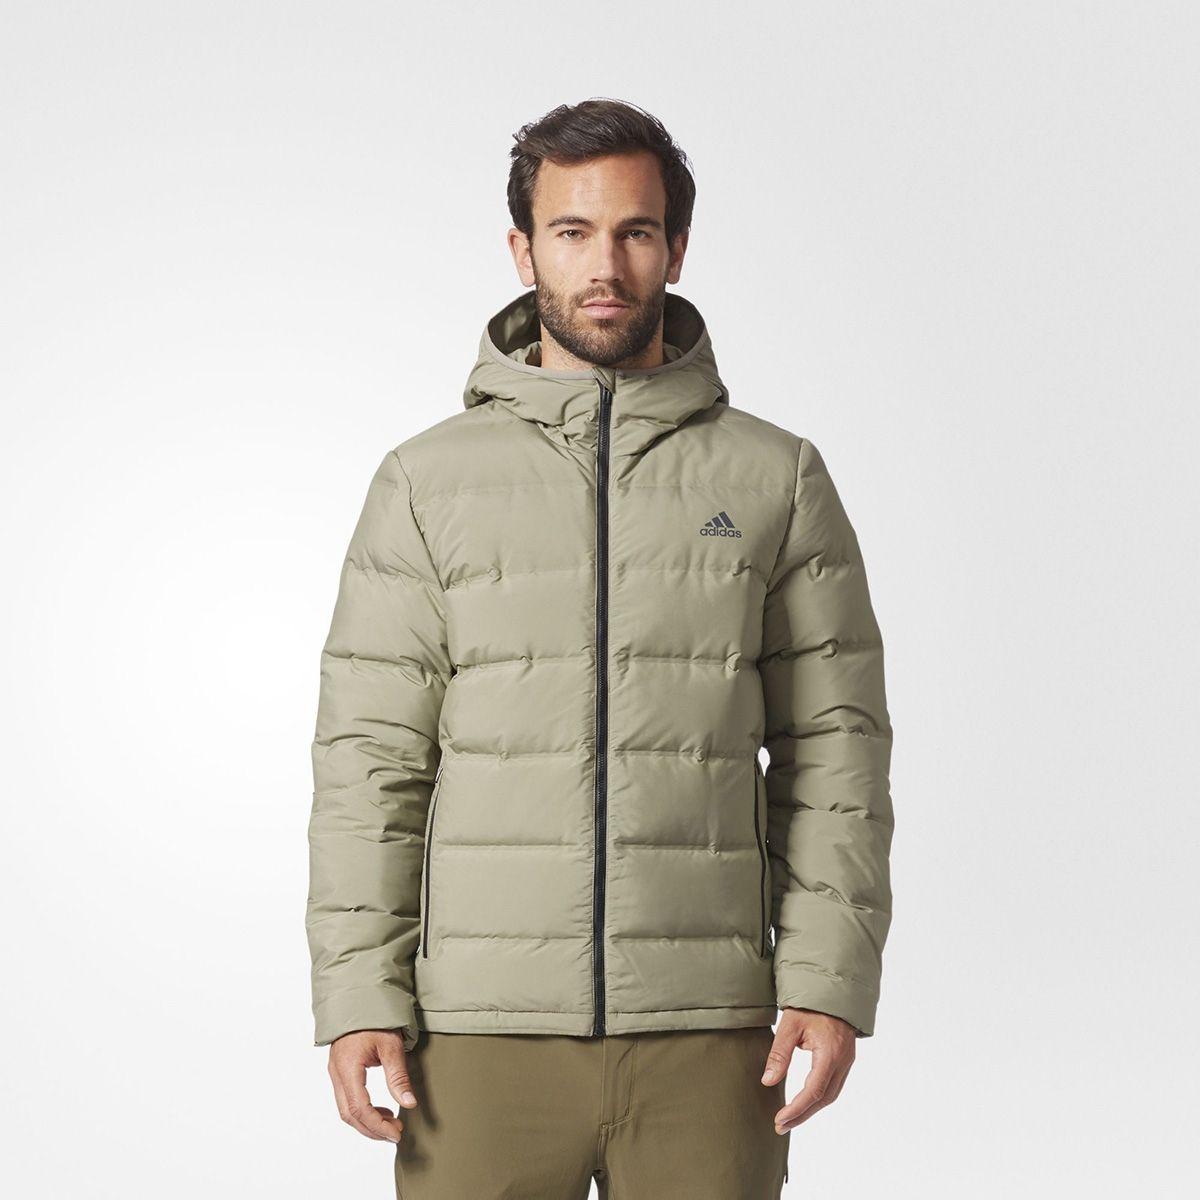 es bonito insondable corazón  Type Jackets adidas Helionic Hooded Down Jacket